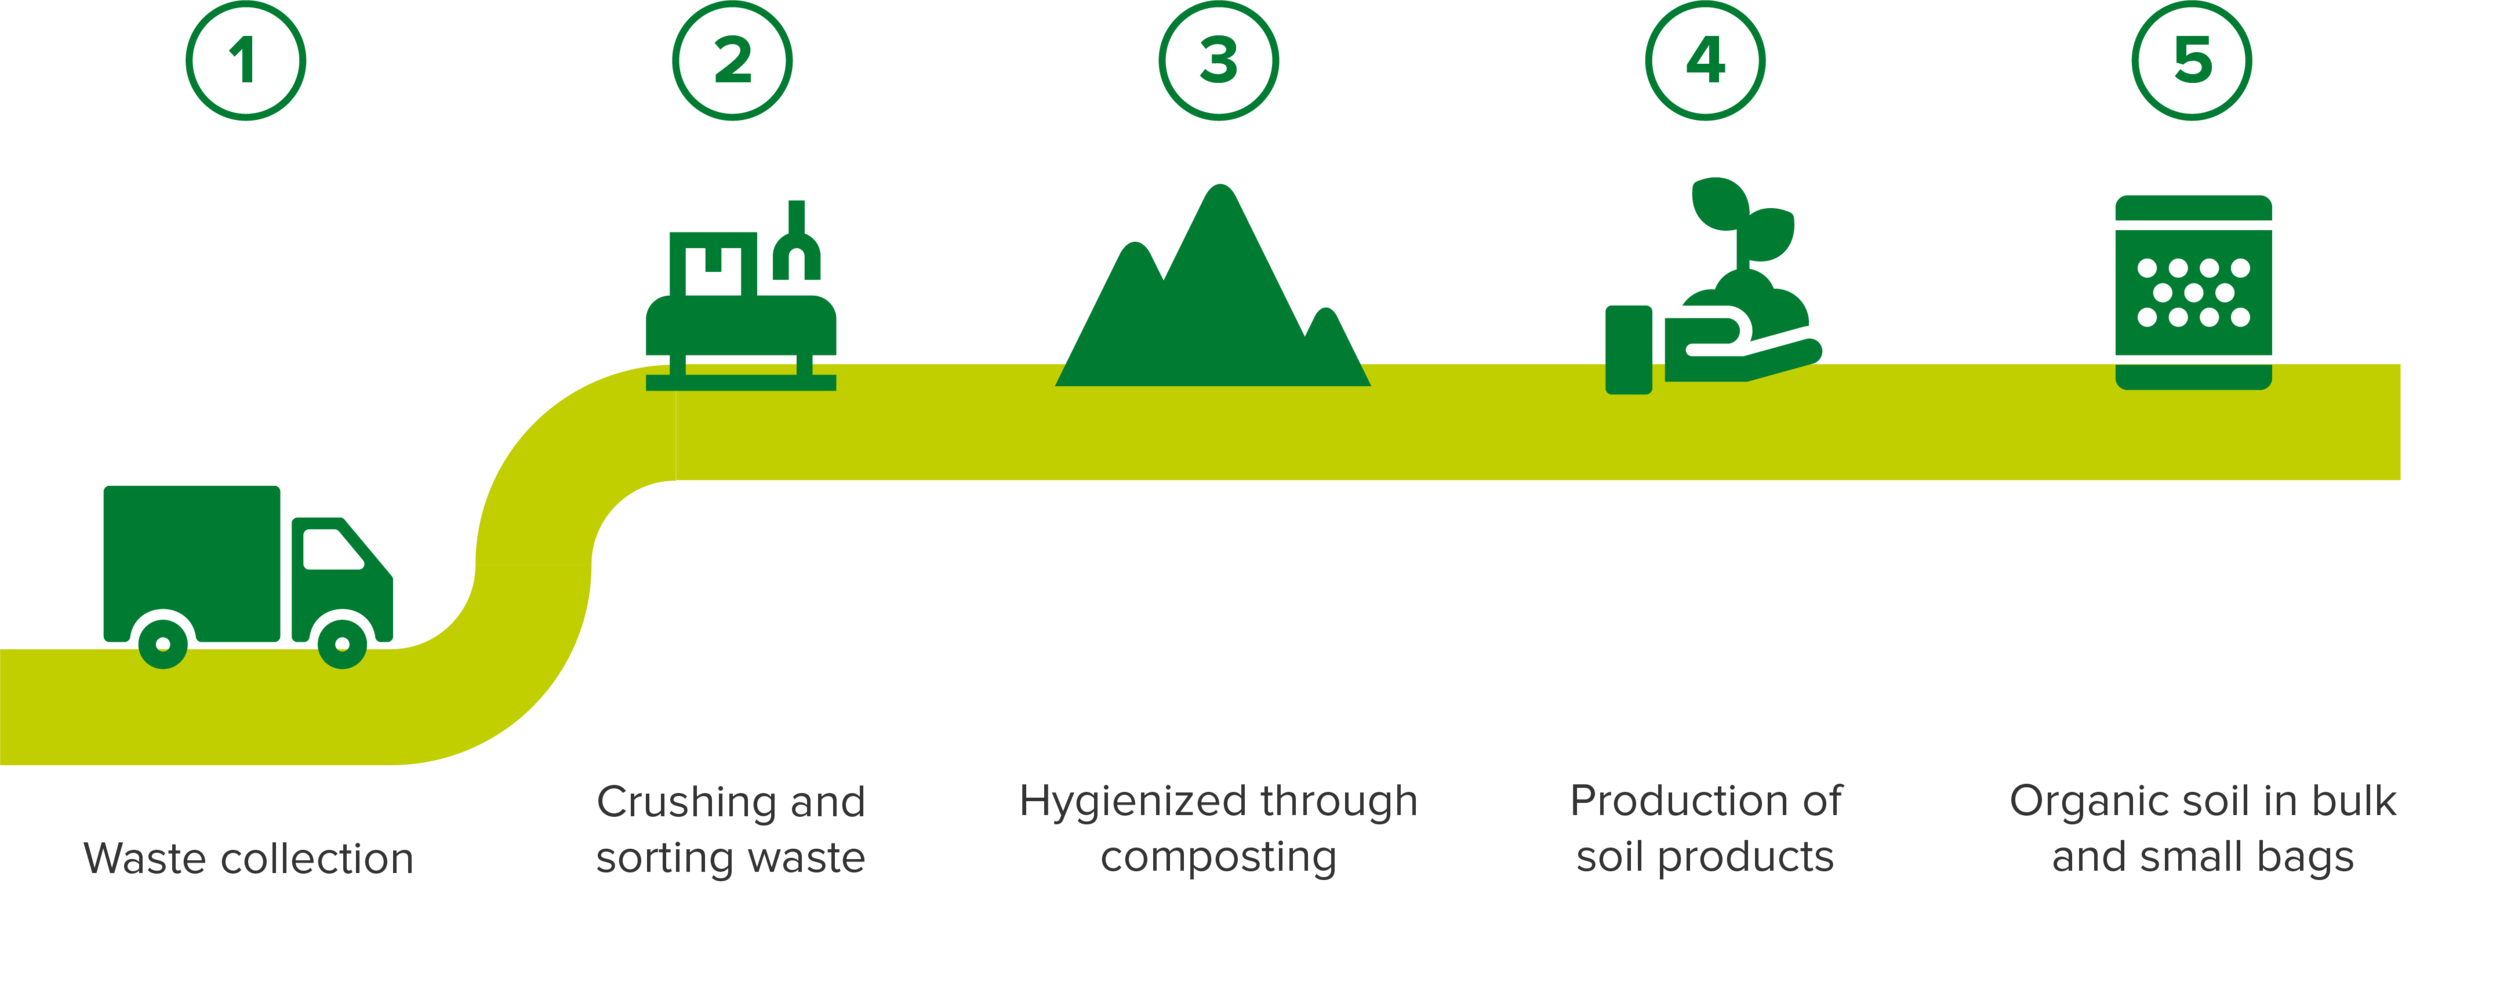 Biodegradable organics.png